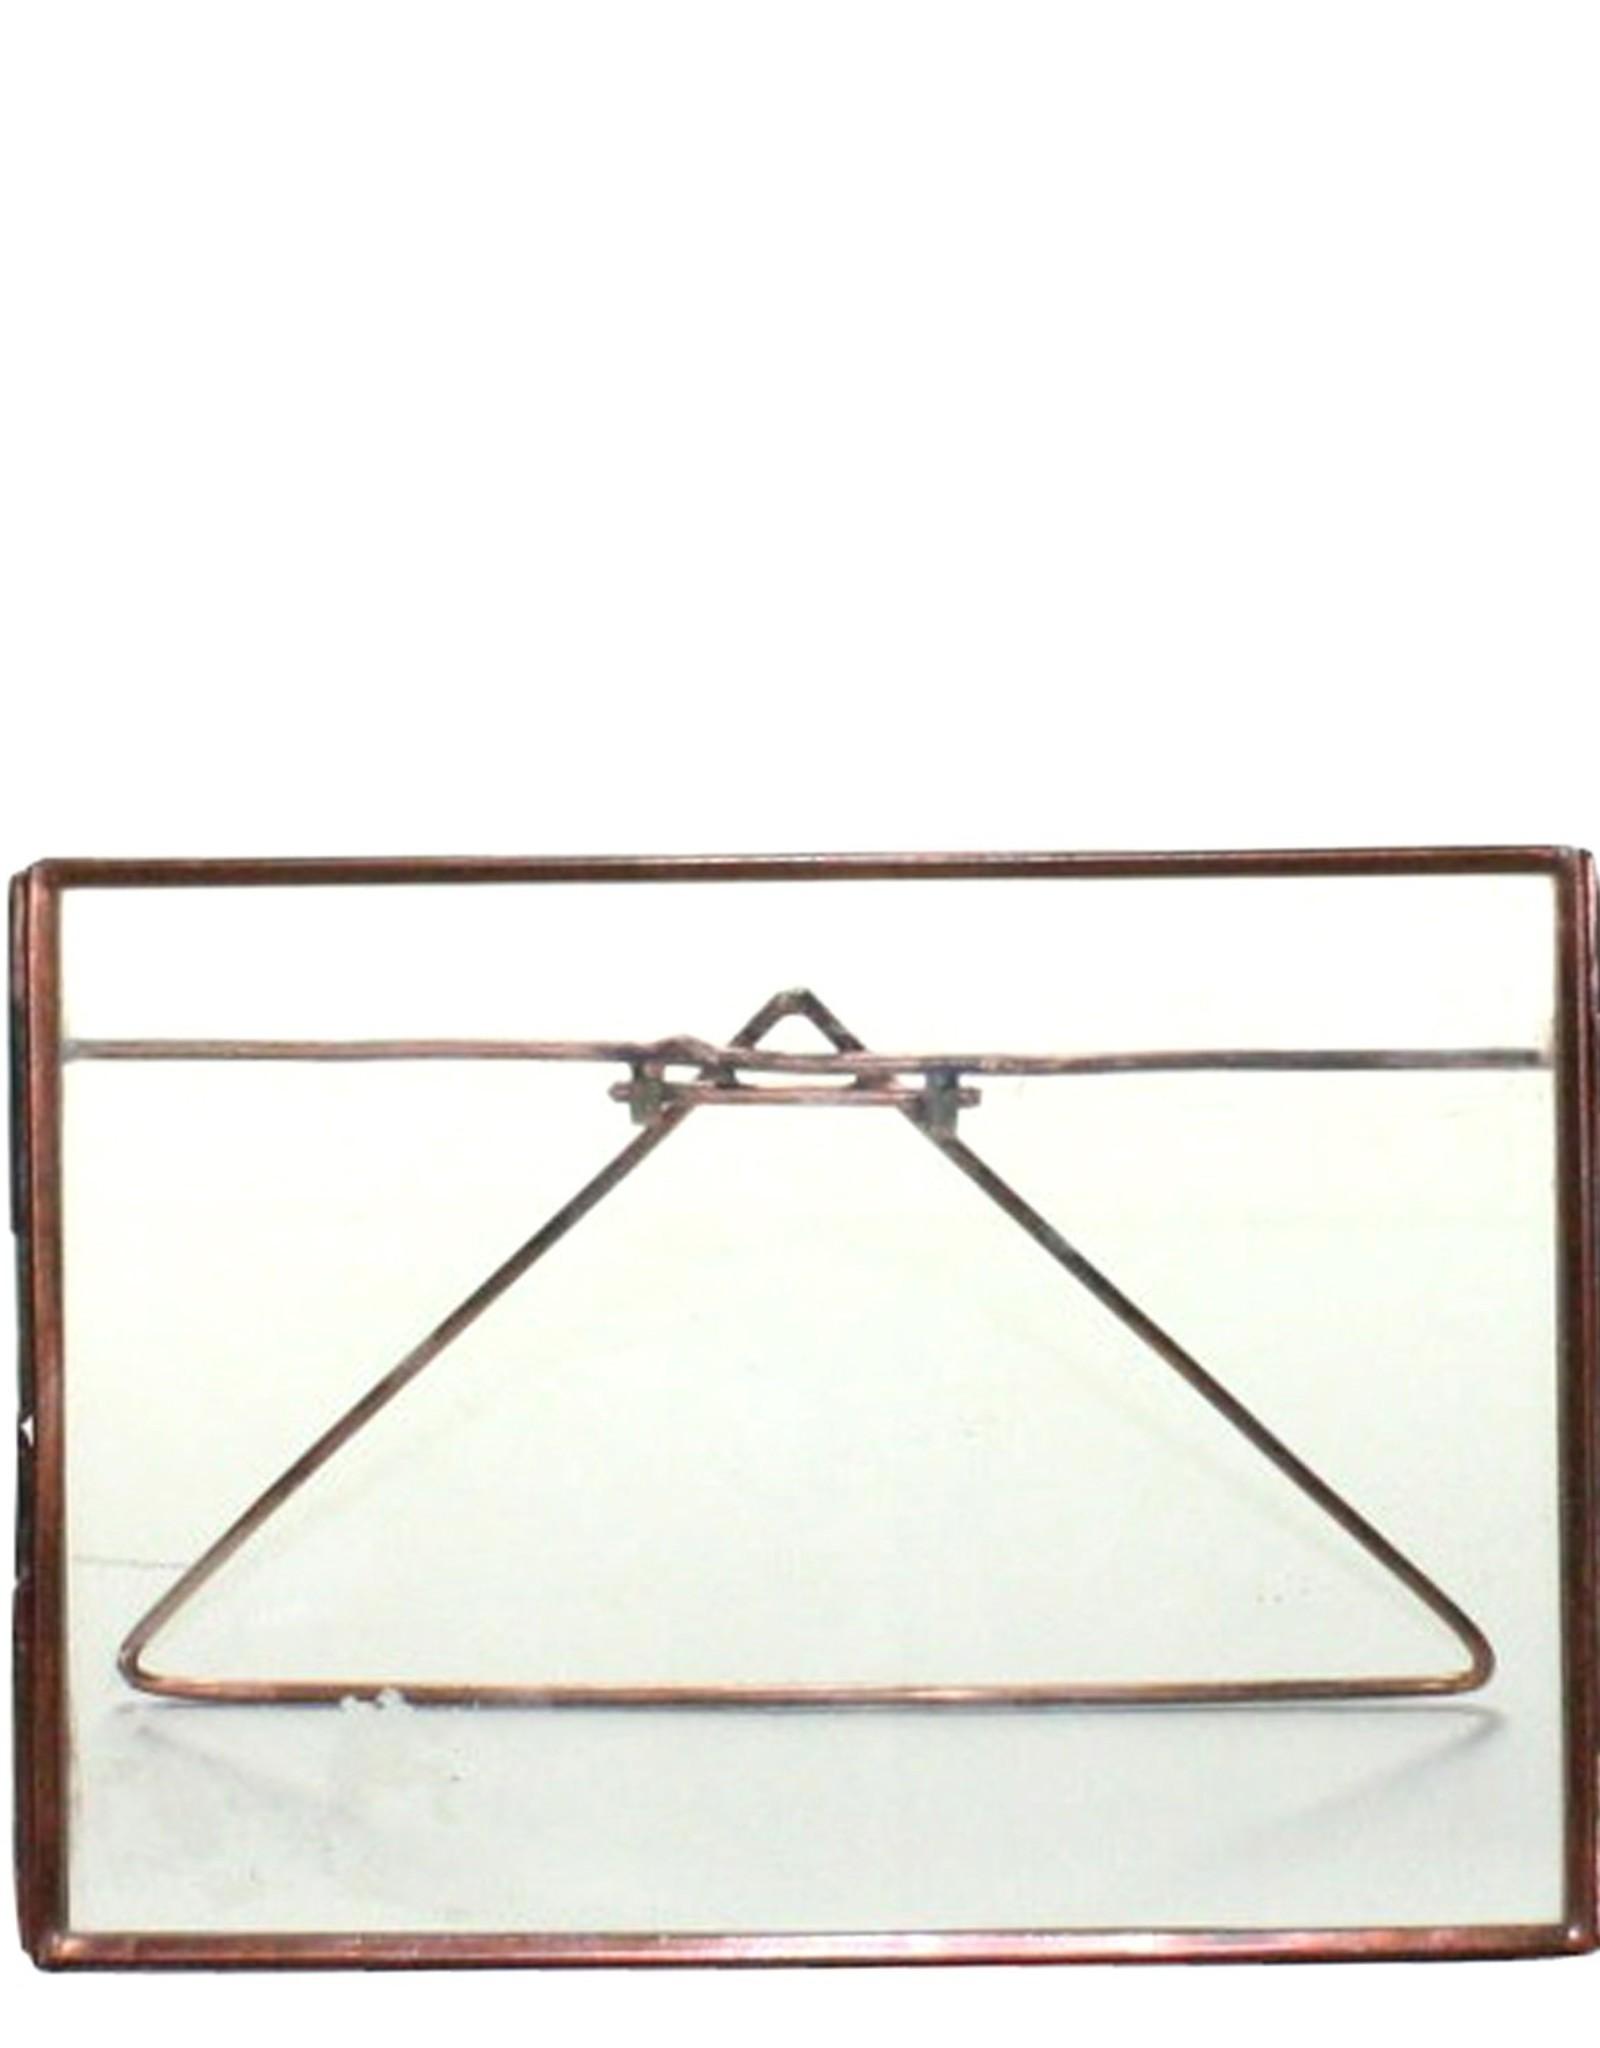 Horizontal 5 x 7 Copper Frame